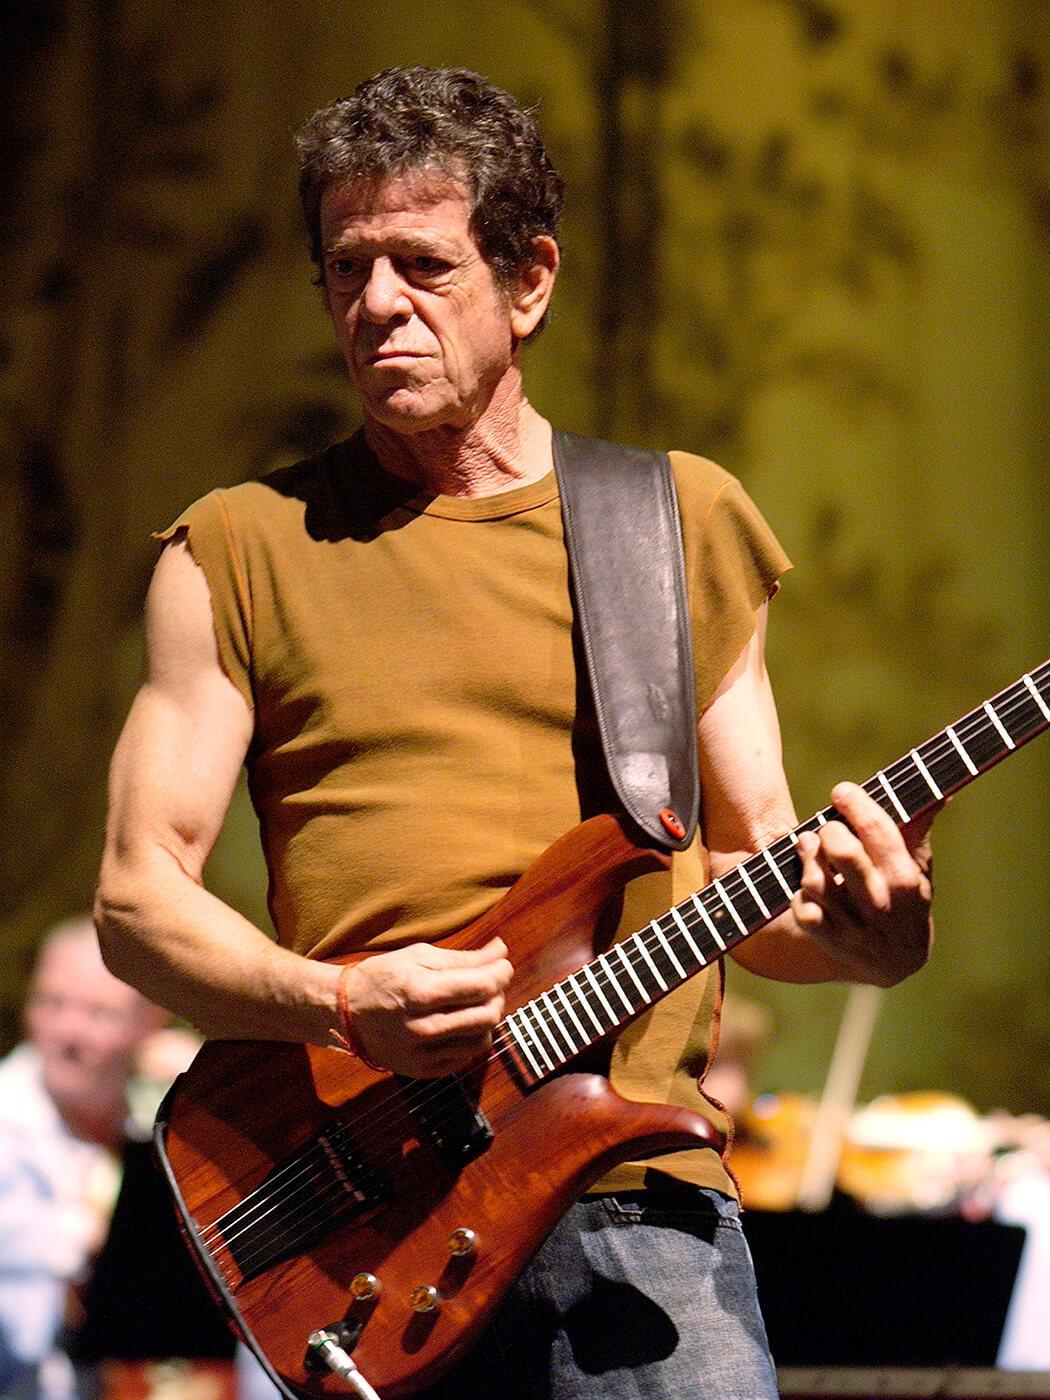 Lou Reed of Velvet Underground